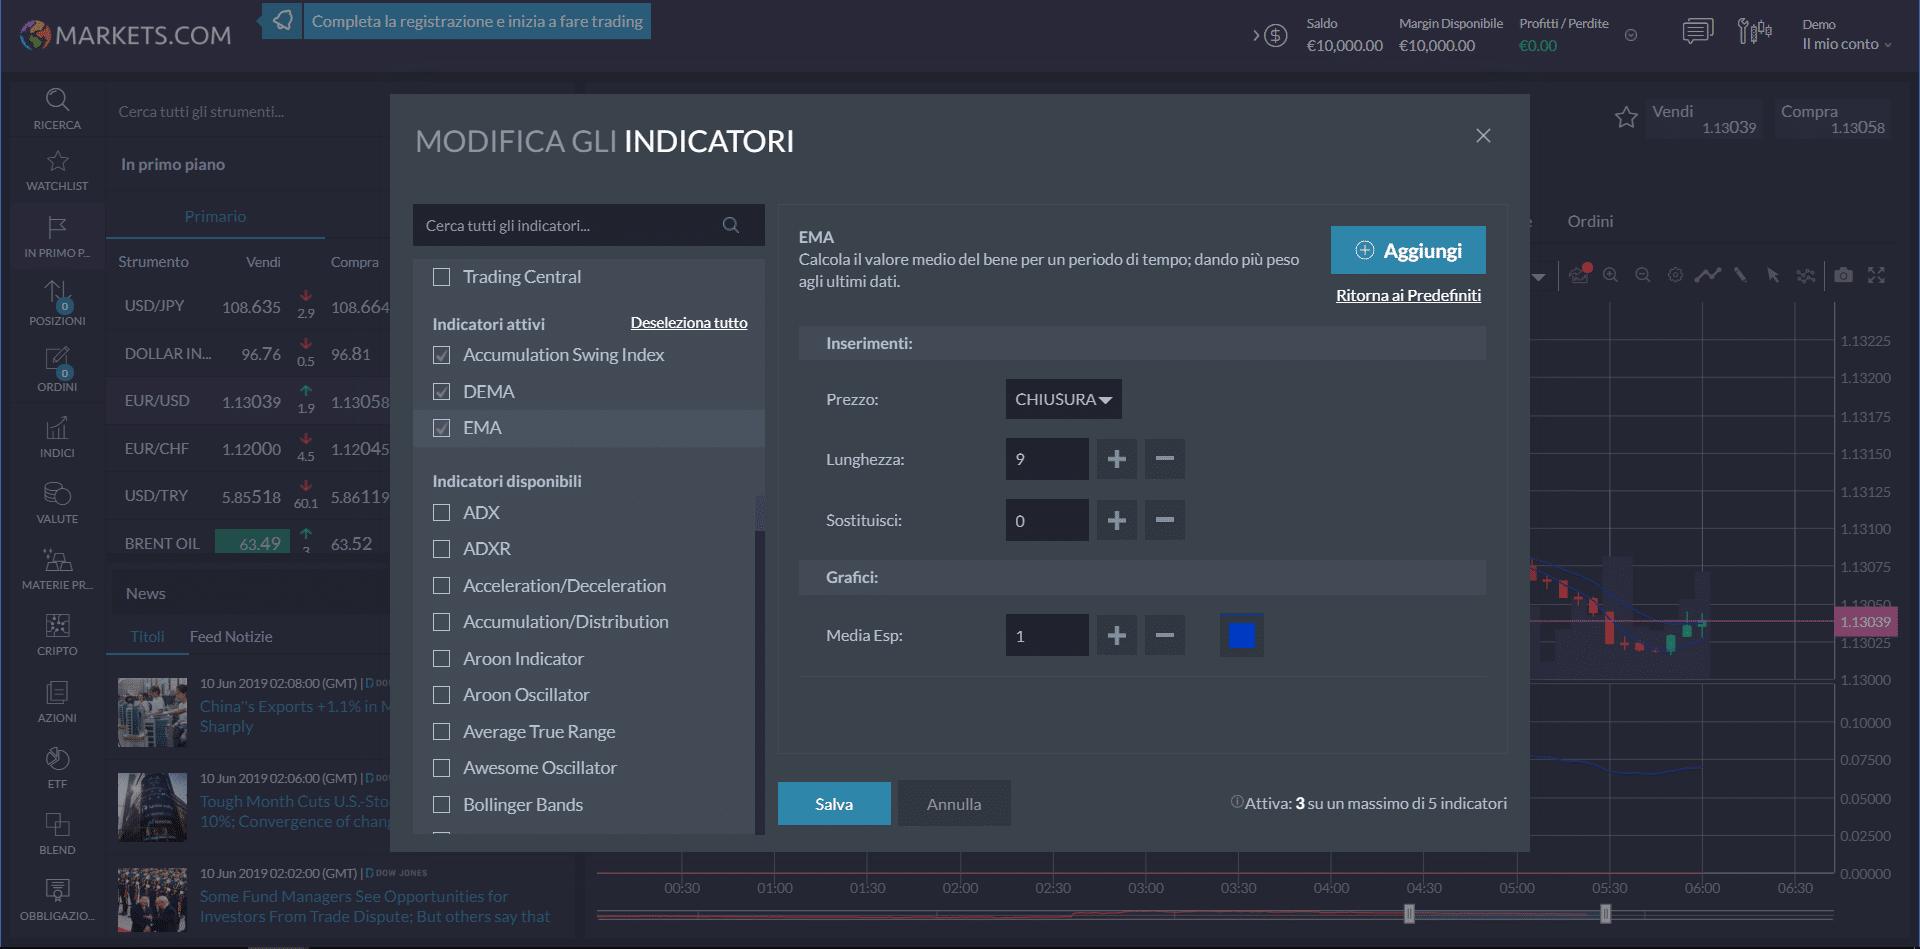 markets.com piattaforma trading indicatori